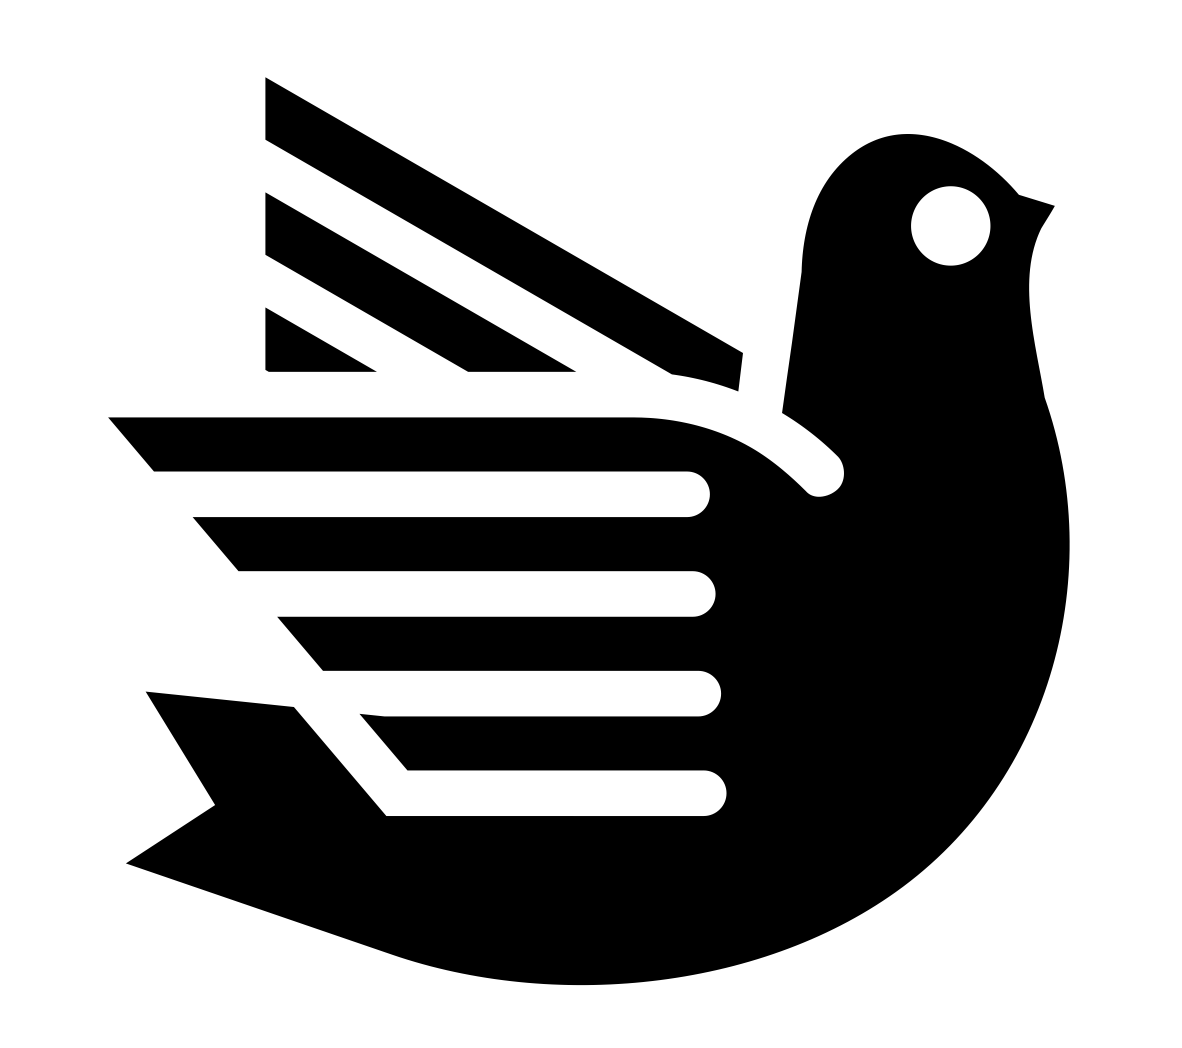 Nova POETIKA - Izdavač i promoter umetnosti